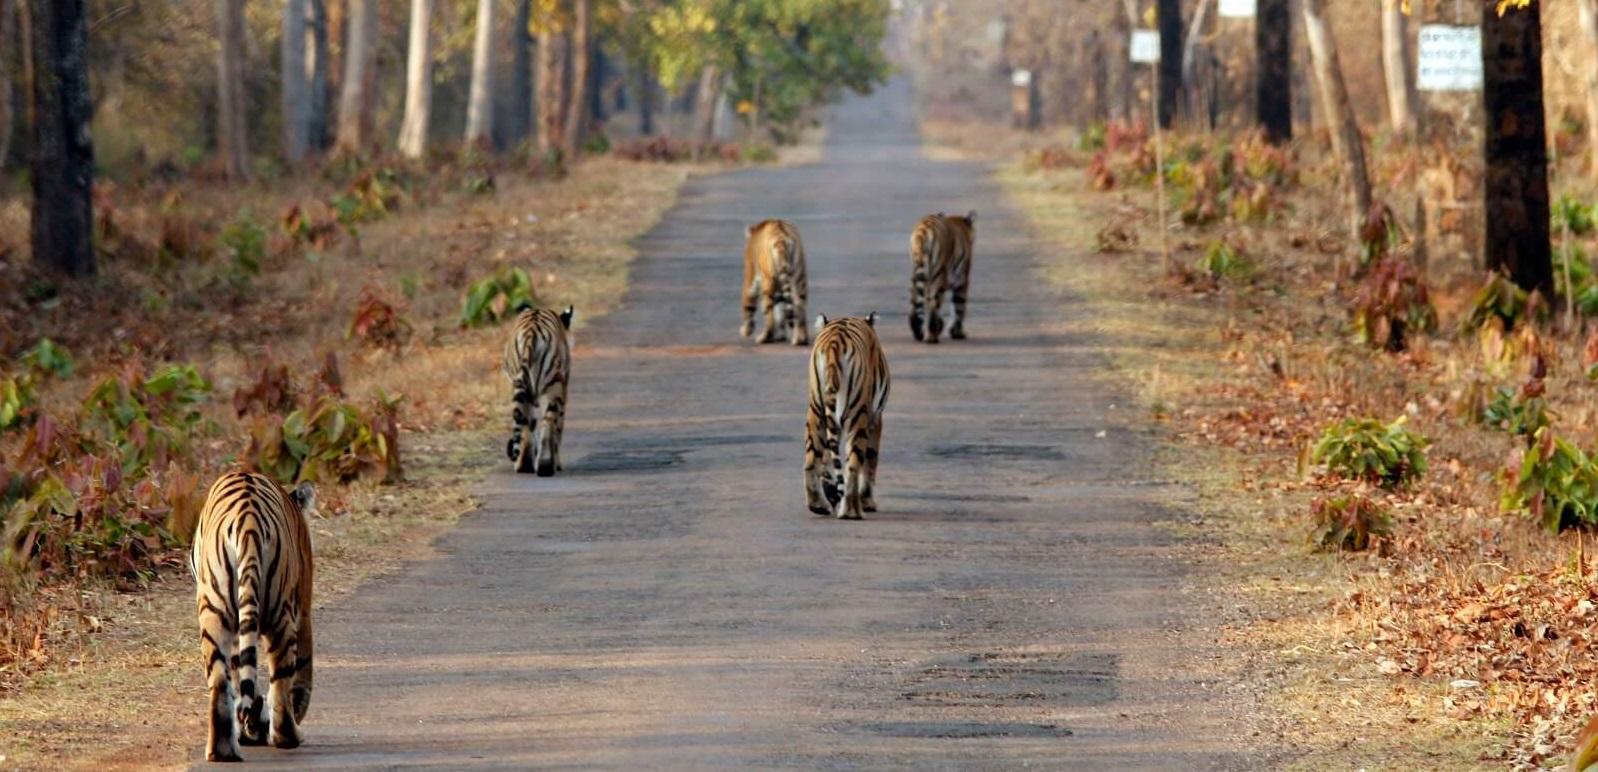 Tadoba Tigerreservat